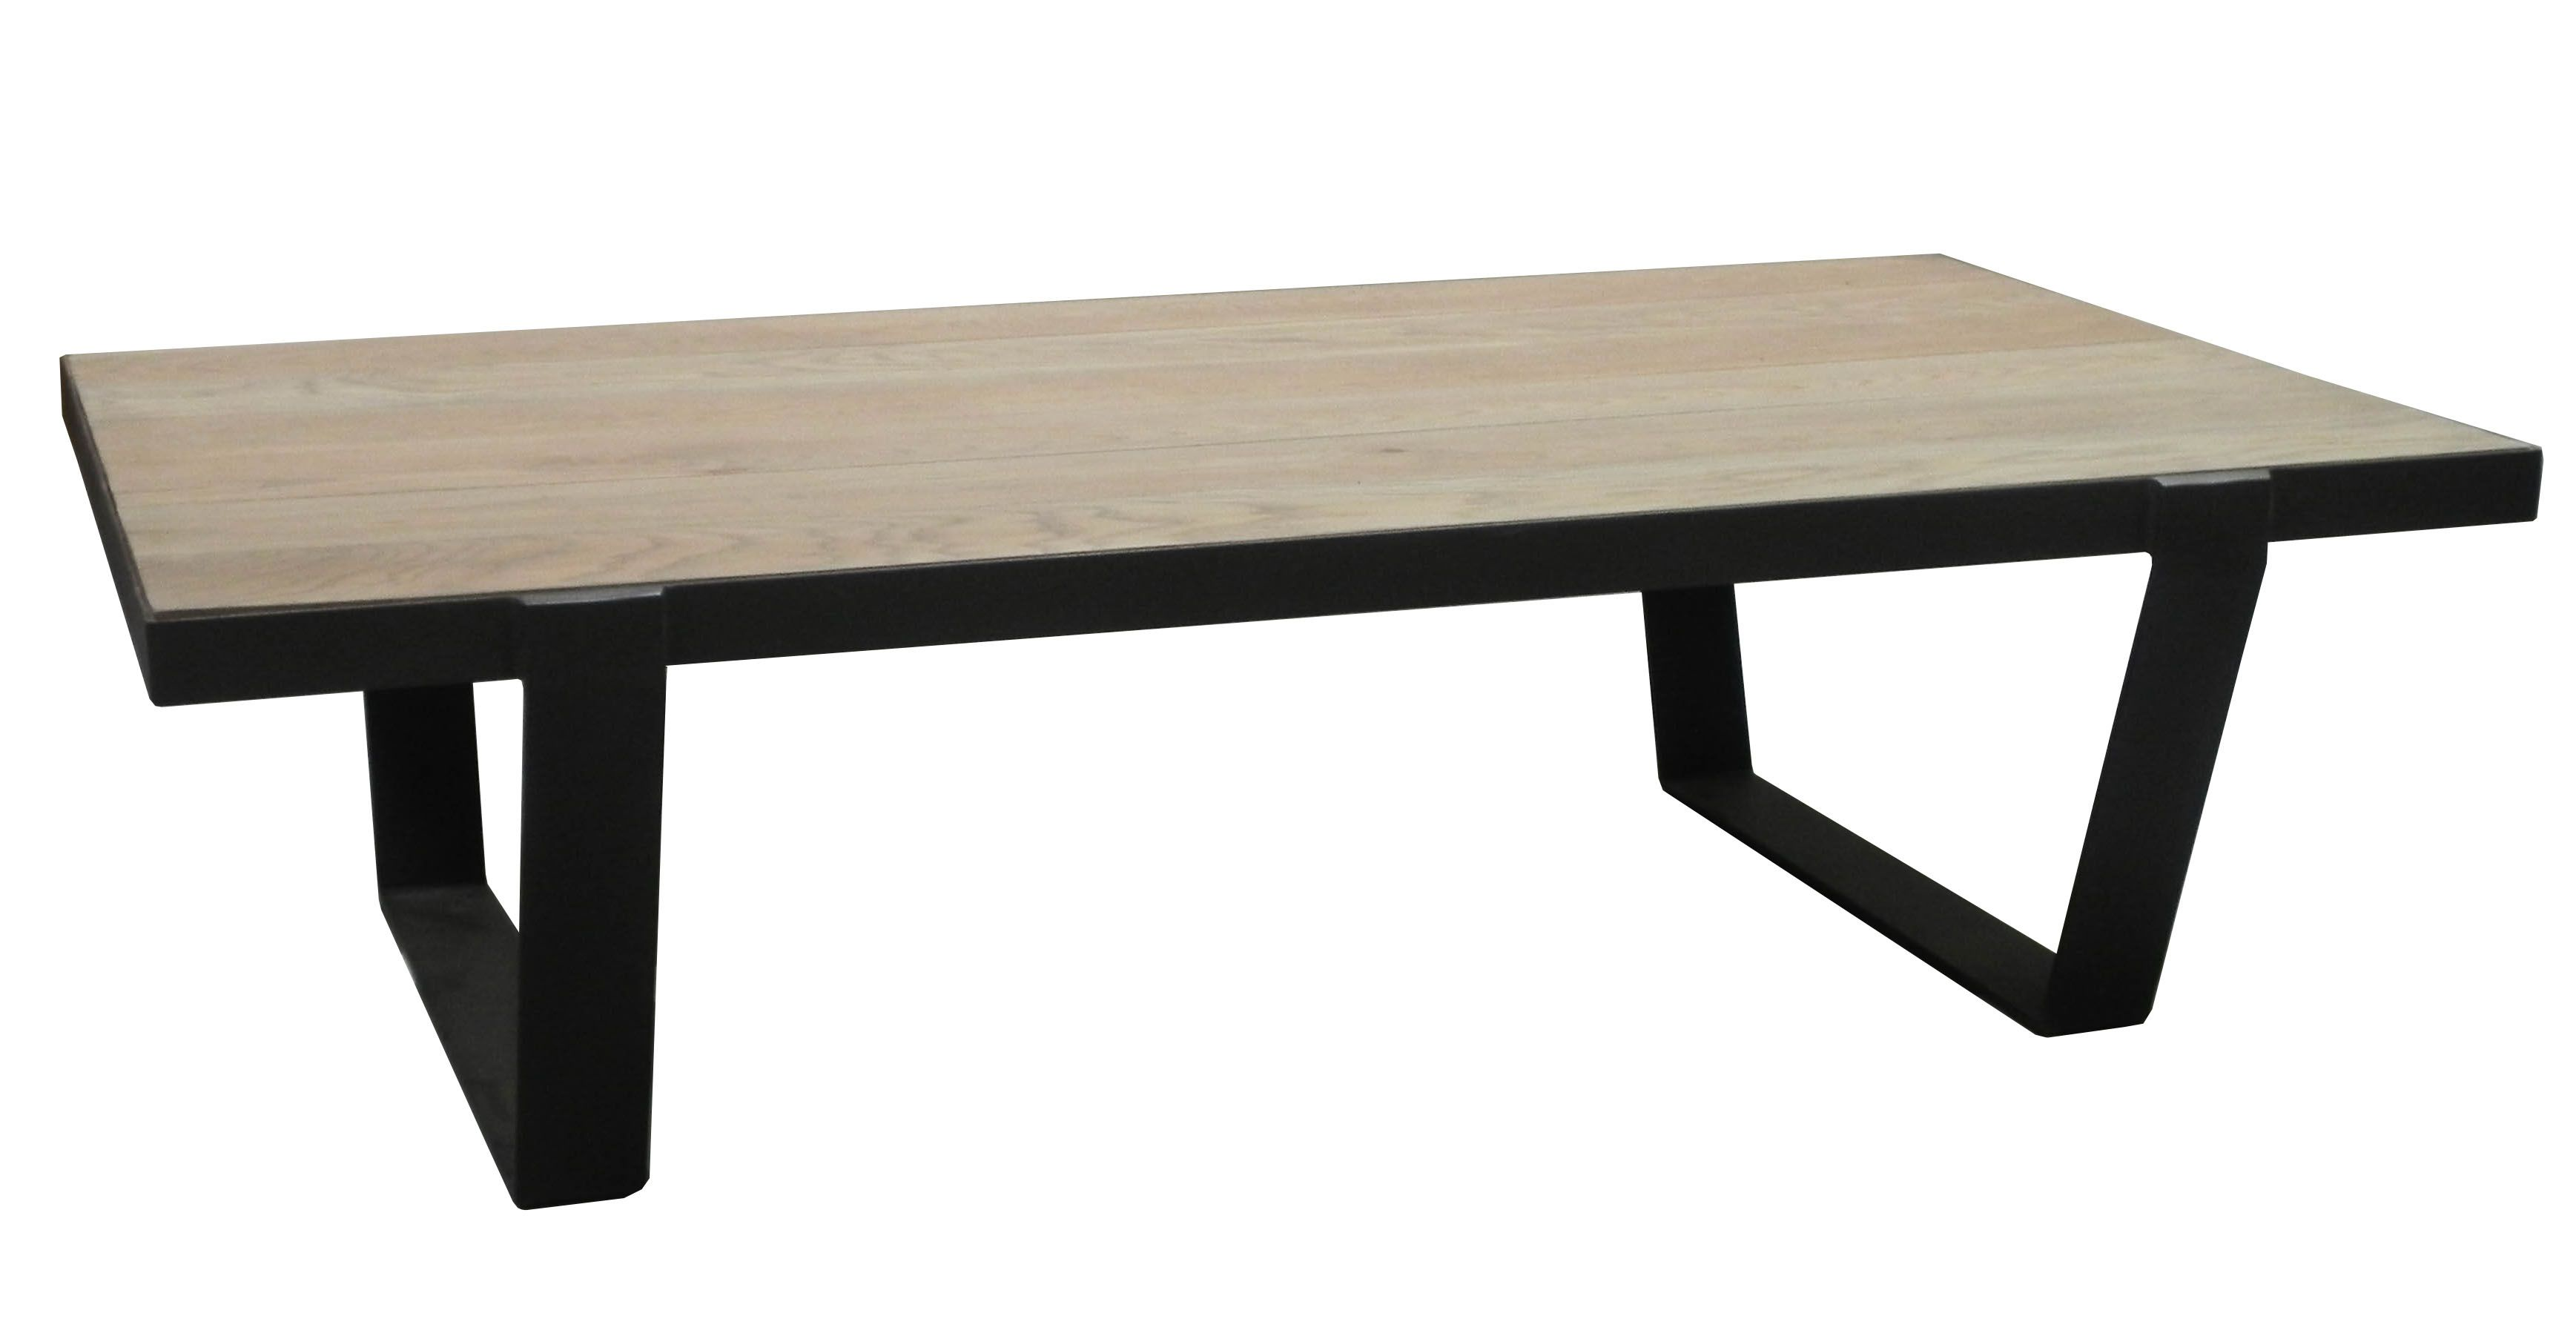 Table Basse Chêne Massif Métal Soomaa Réf 30020862 Table